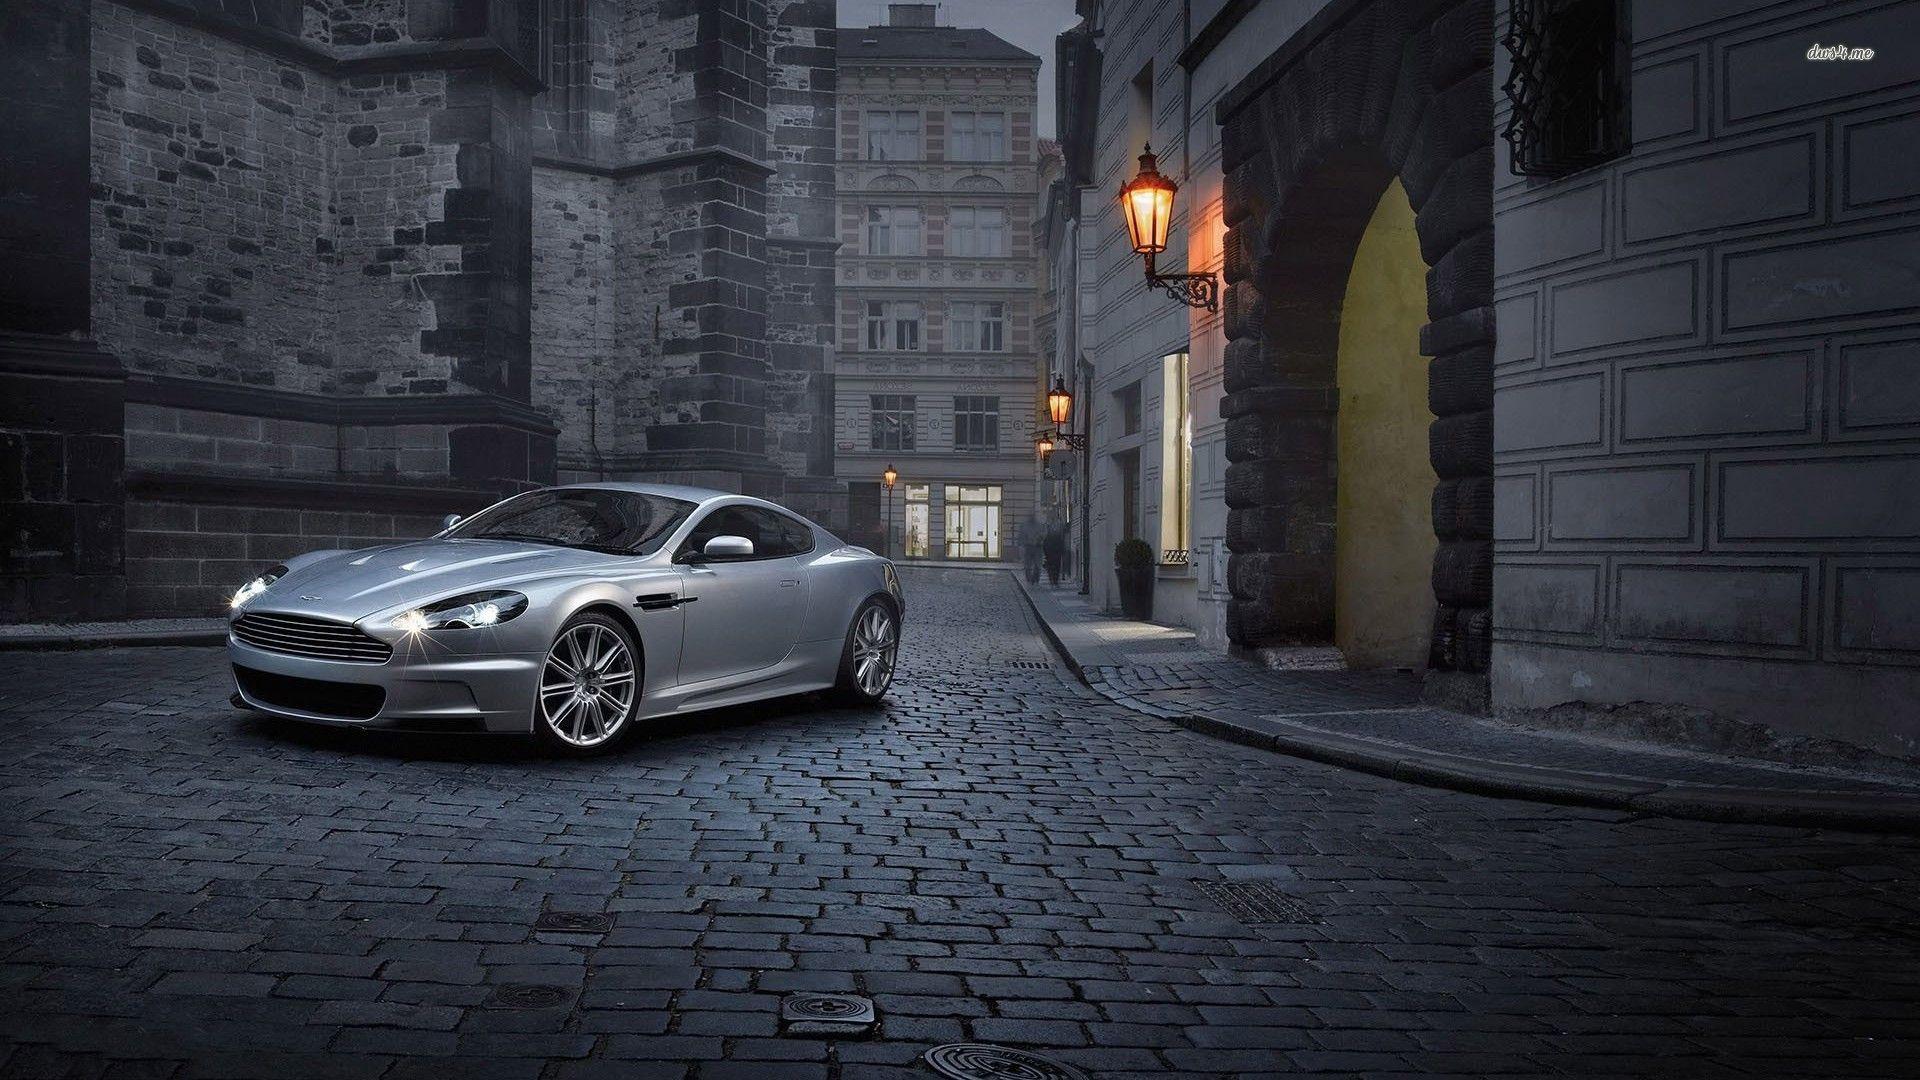 Audi Q7 H Ada Googlom Aston Martin Dbs Aston Martin Martin Wallpaper